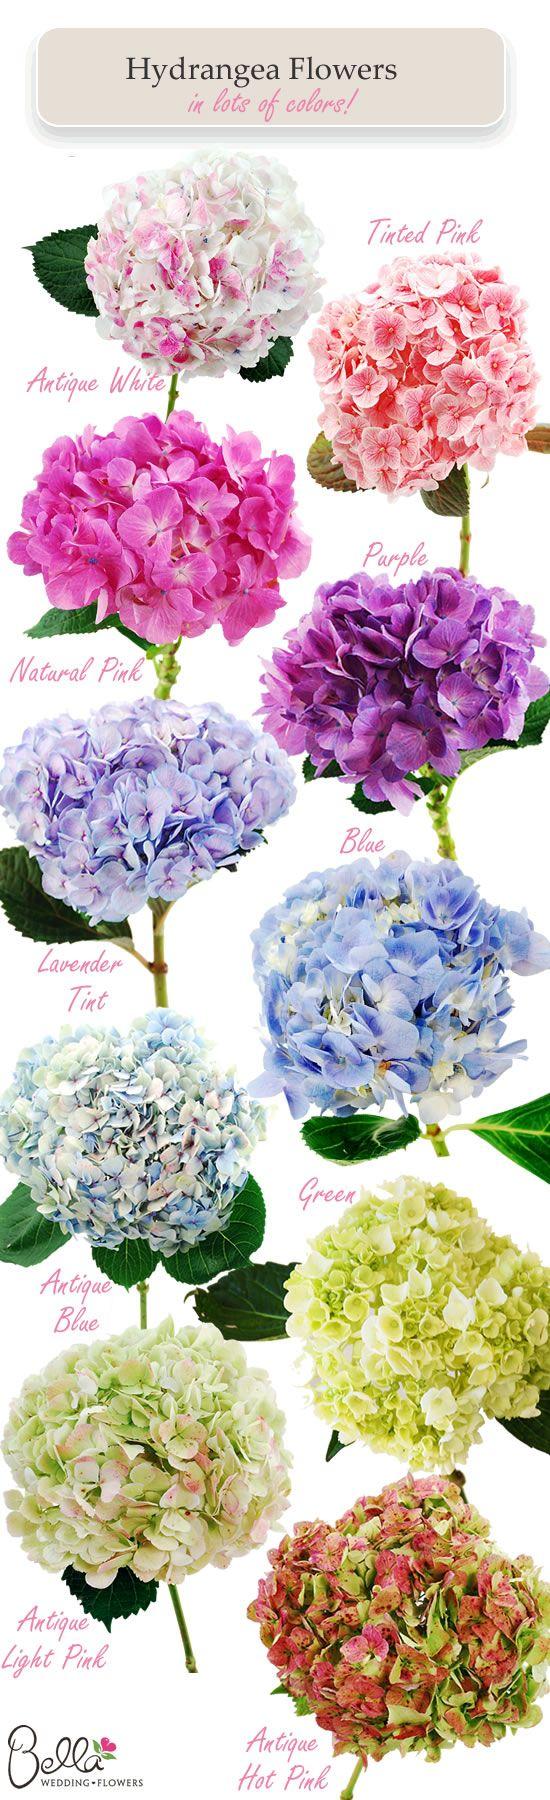 Five Simple Organic Gardening Ideas Tips For Your Backyard Hydrangea Colors Flower Arrangements Beautiful Flowers